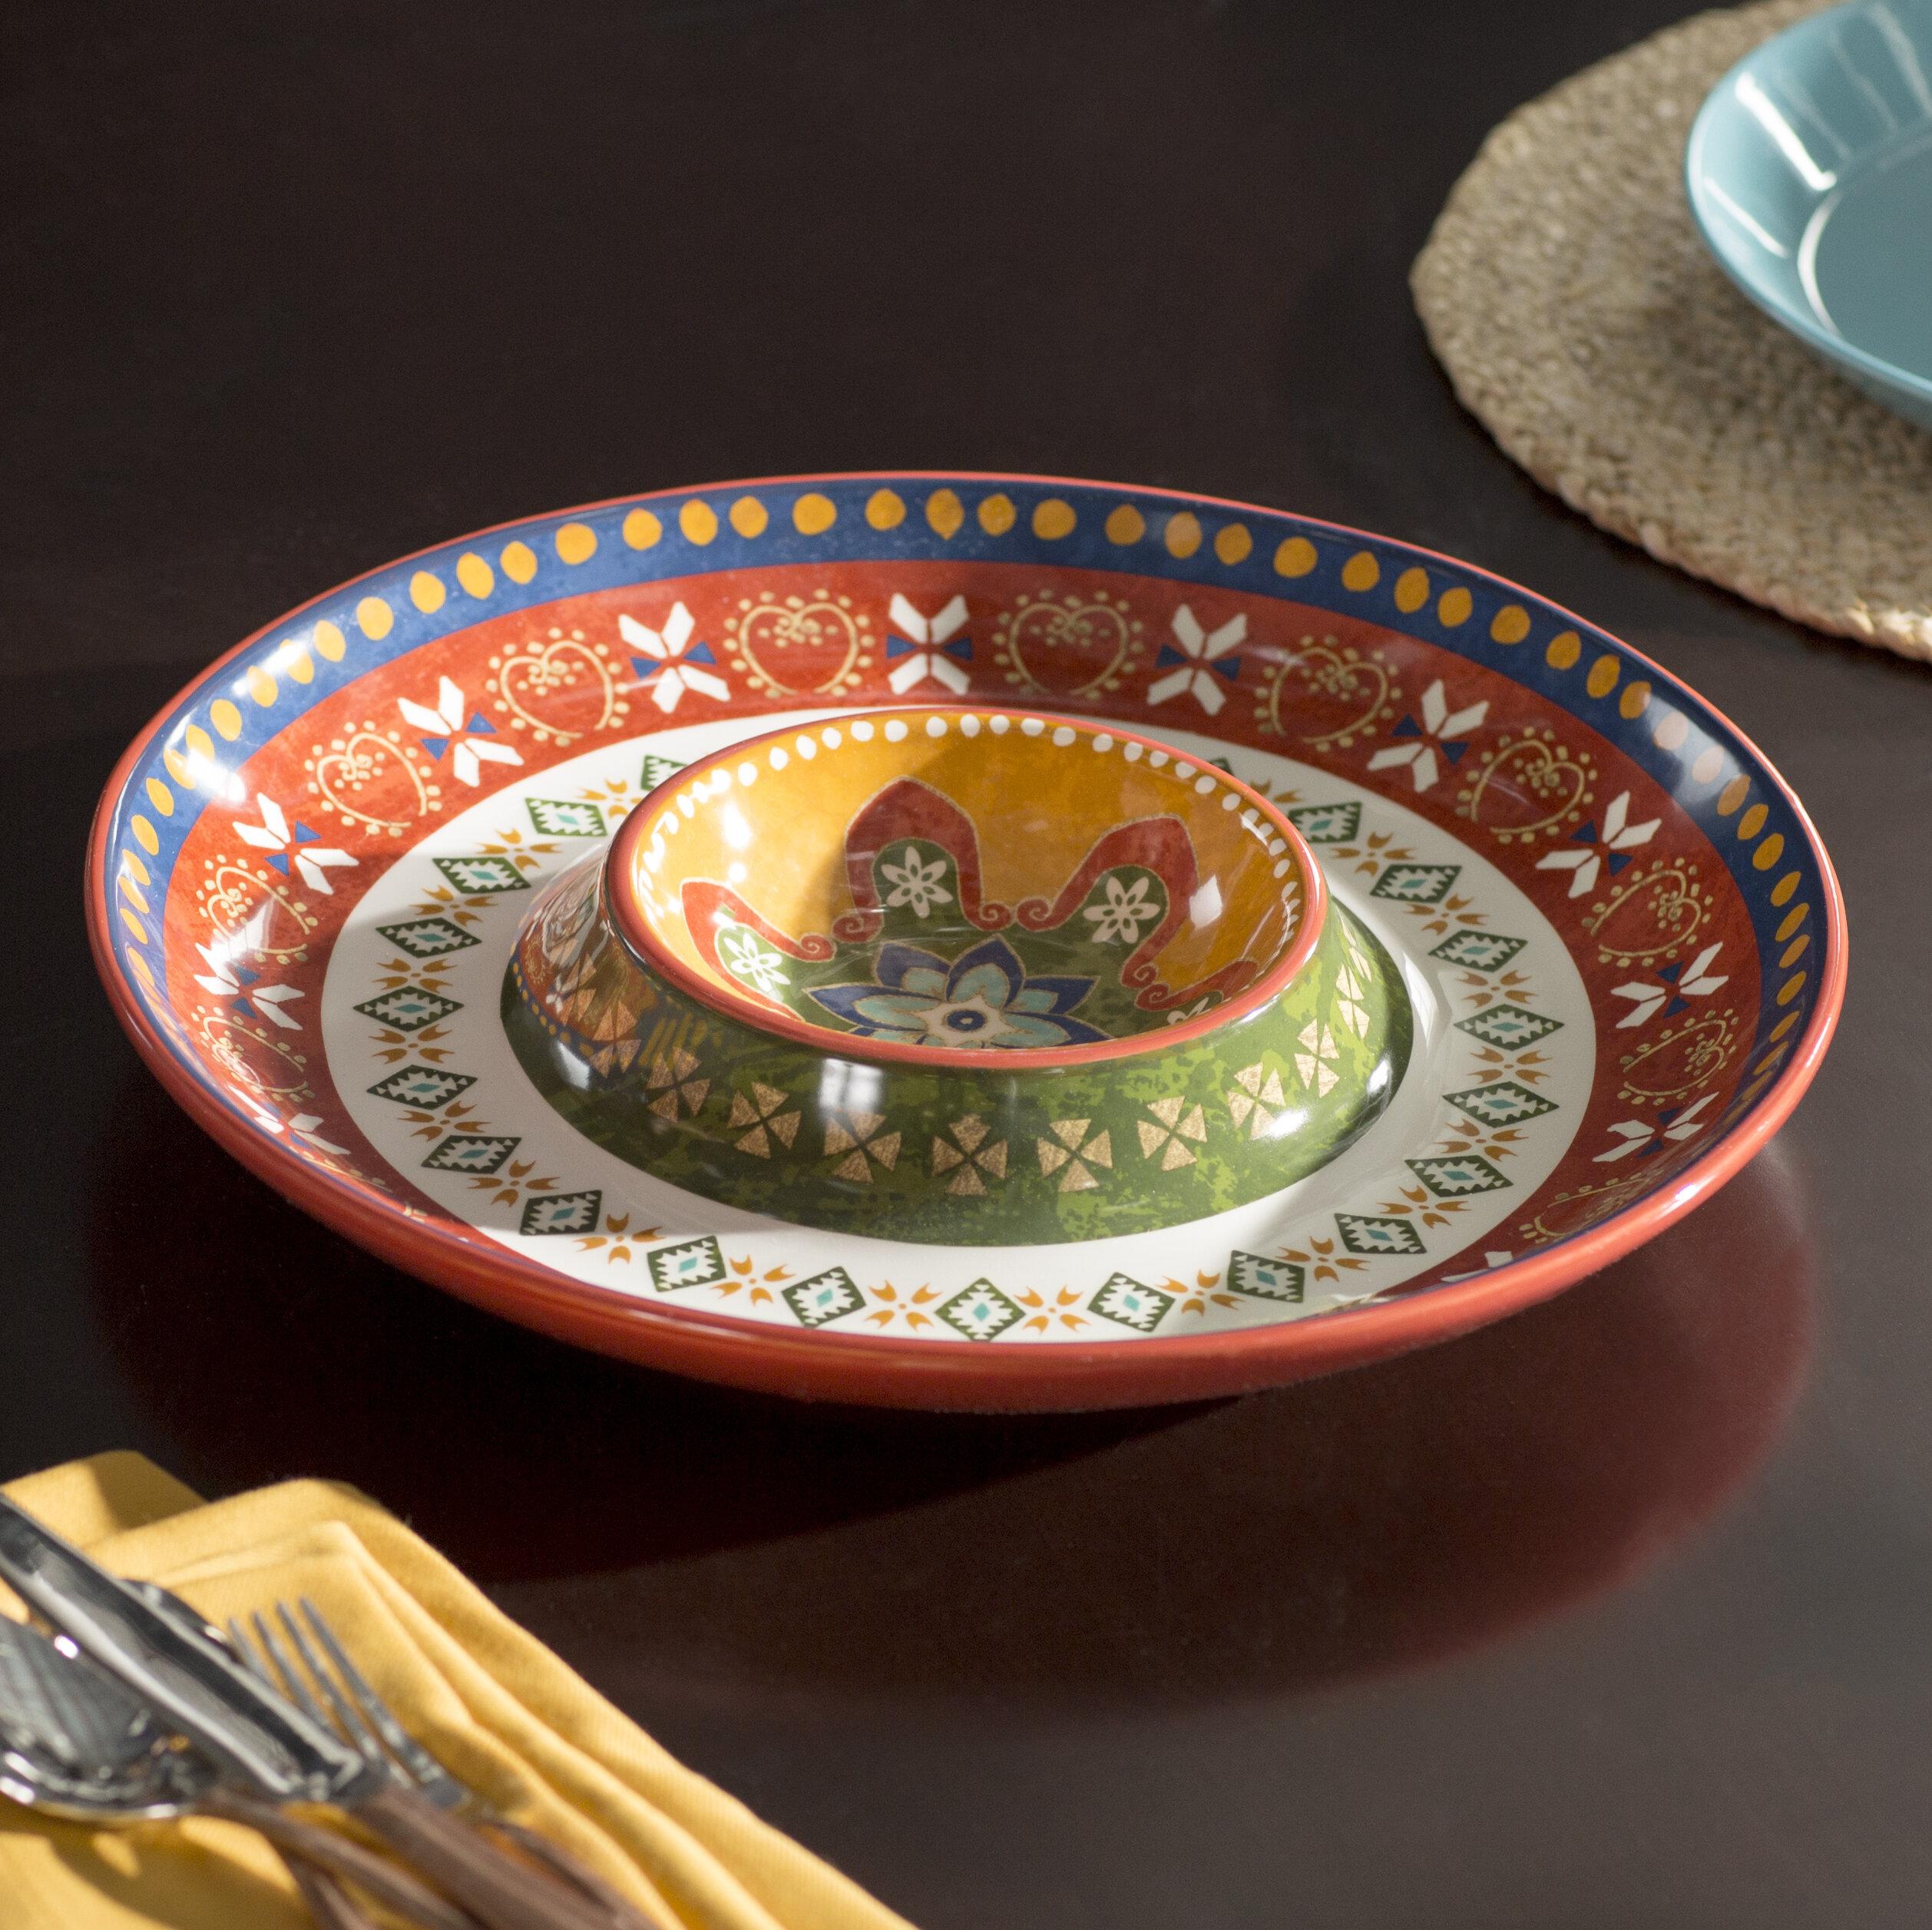 World Menagerie Brimson Chip And Dip Platter Reviews Wayfair Ca